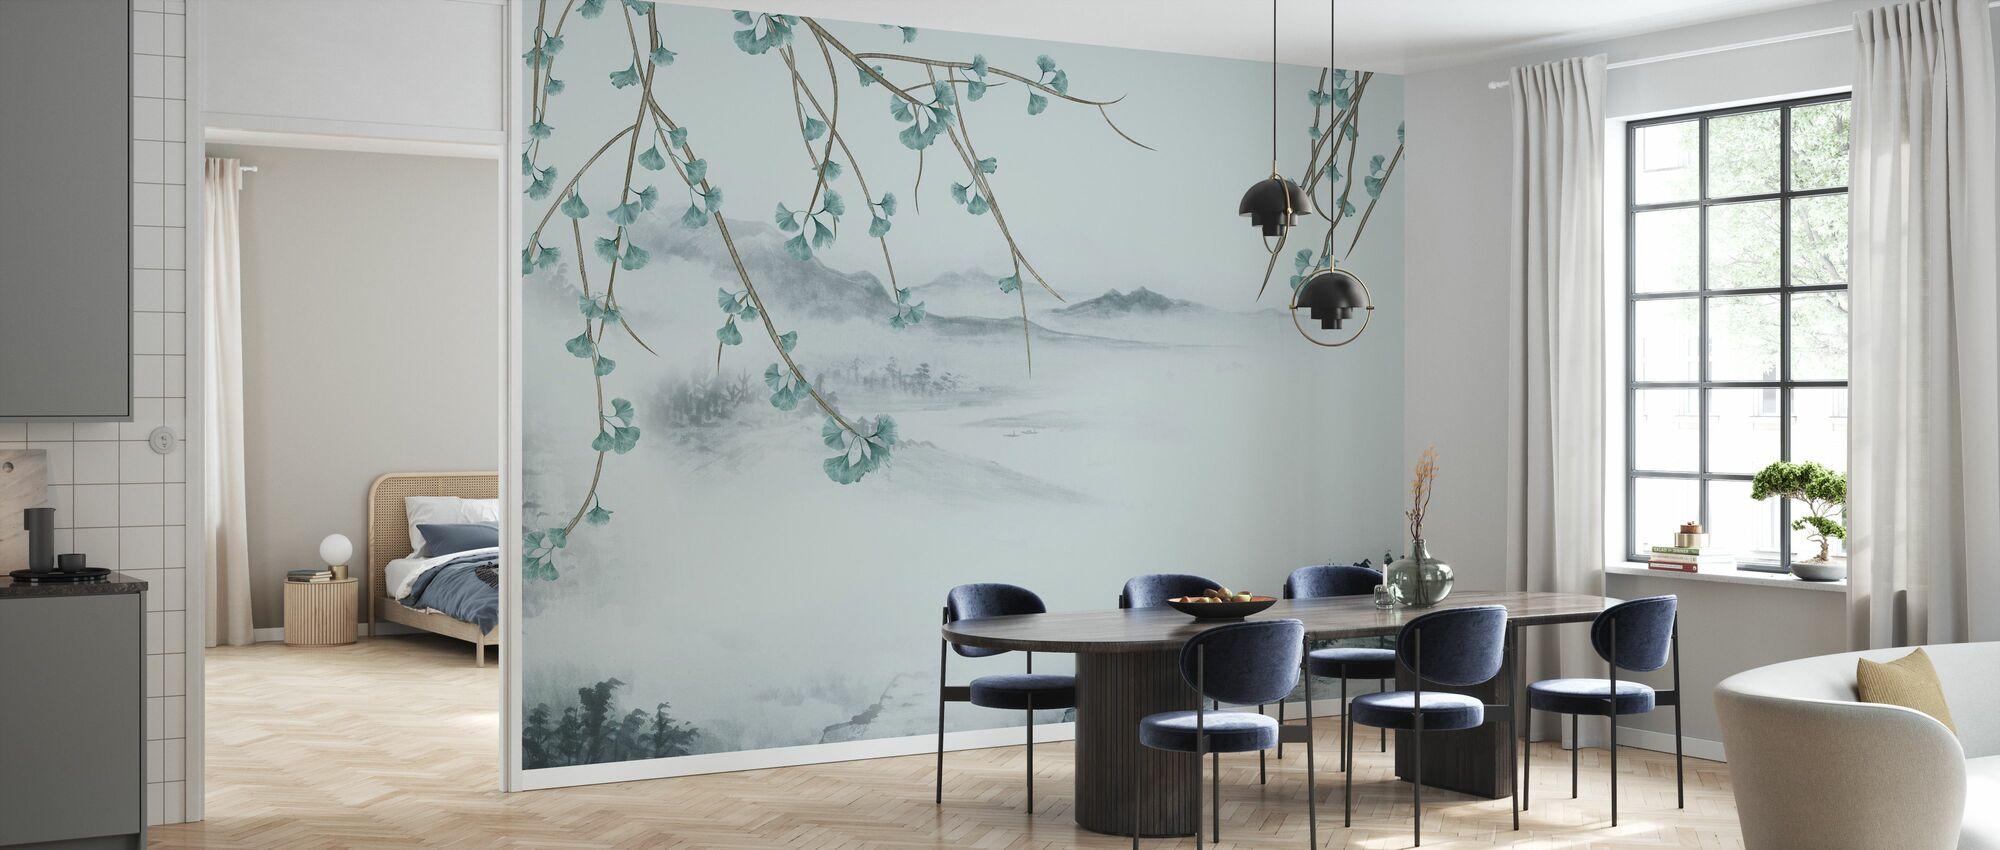 Chinese Scenery - Wallpaper - Kitchen